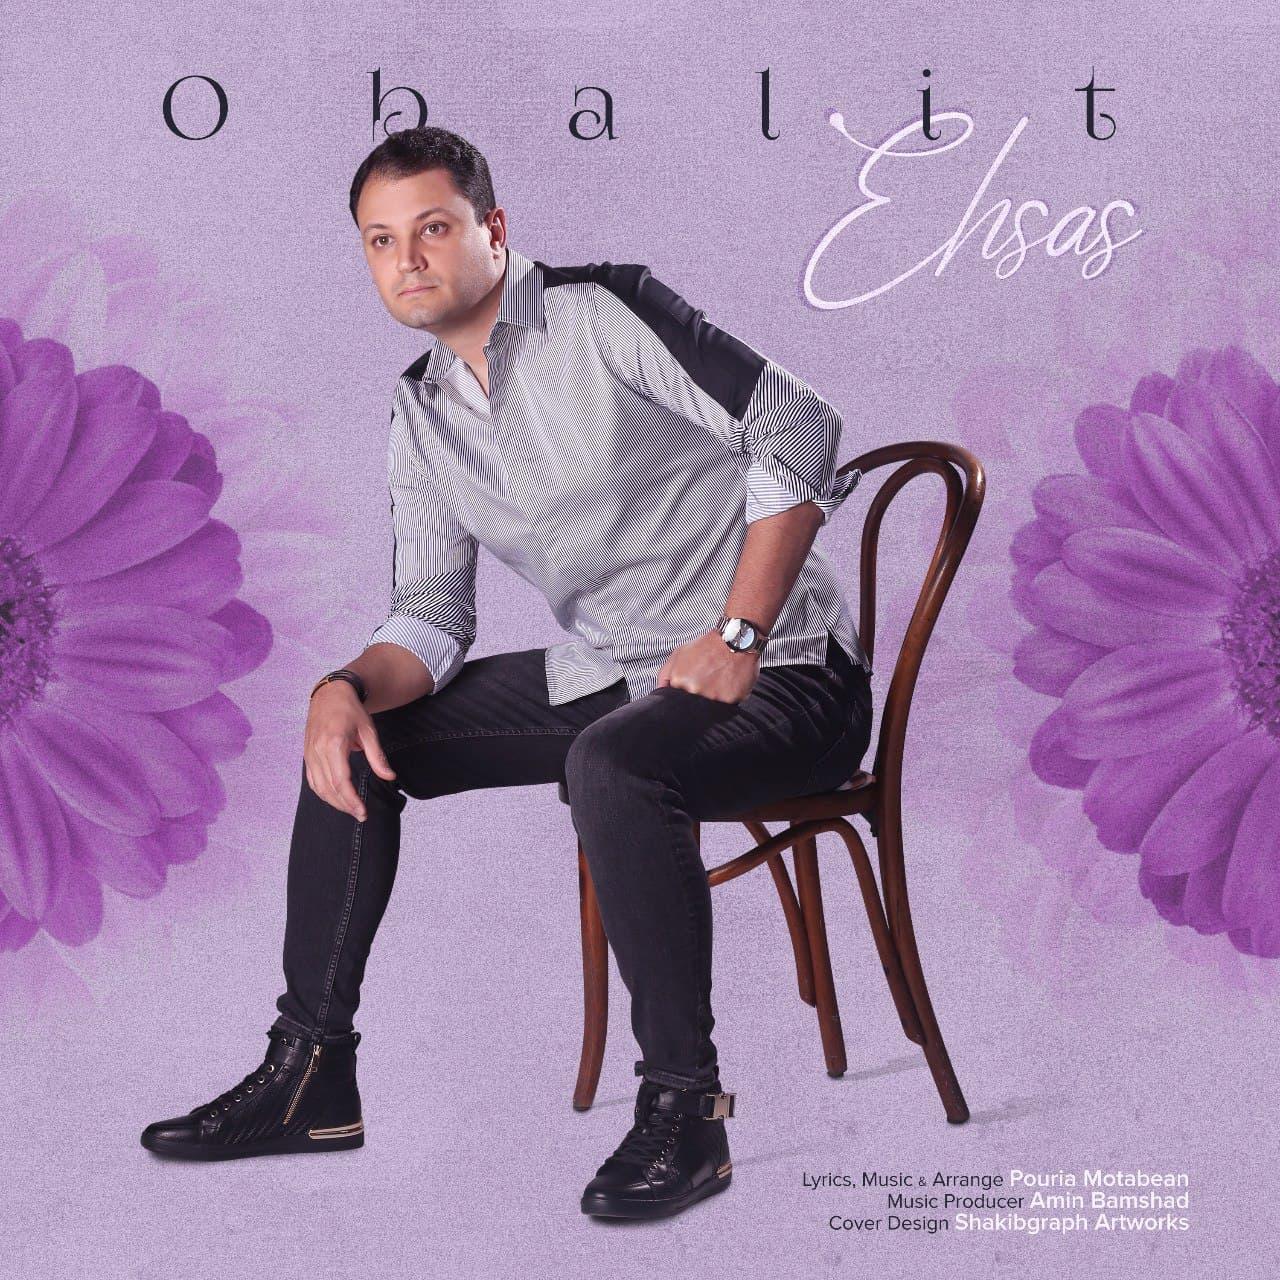 Obalit – Ehsas